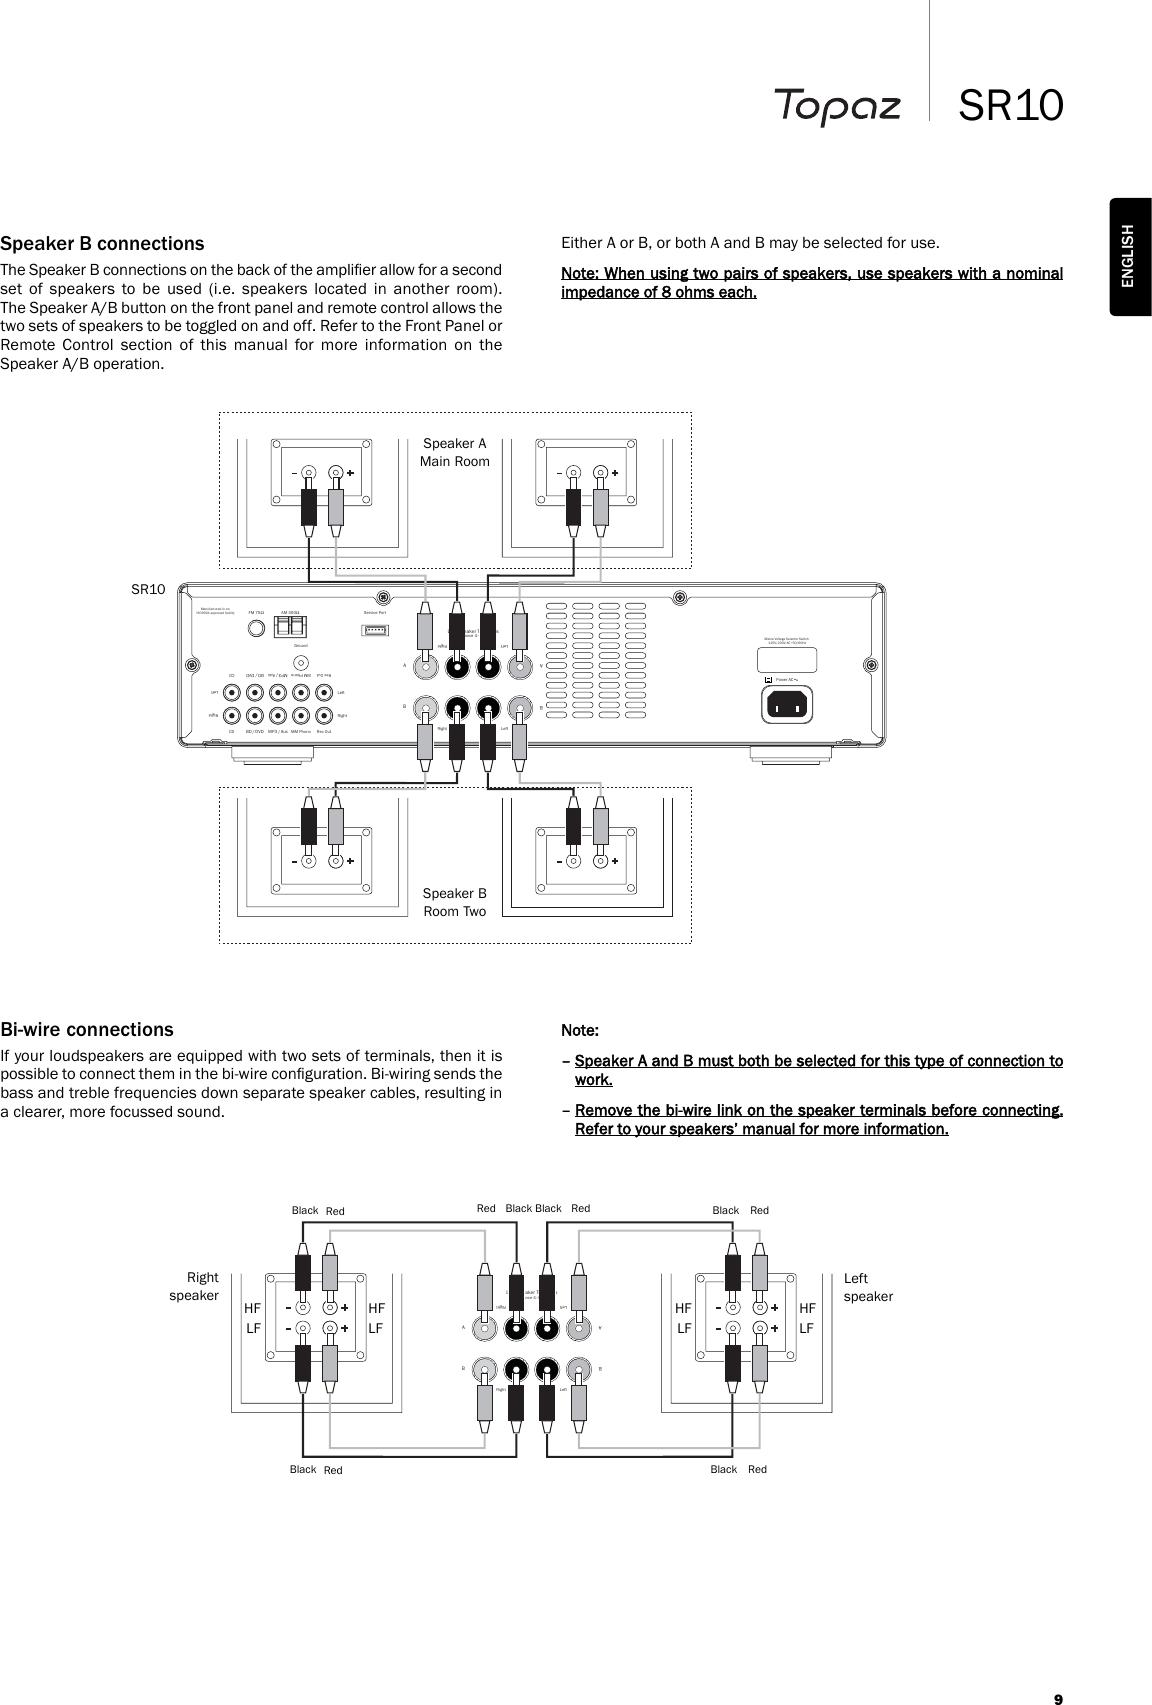 Cambridge Audio Topaz Sr10 Users Manual Bi Wiring Speakers Diagram Page 9 Of 12